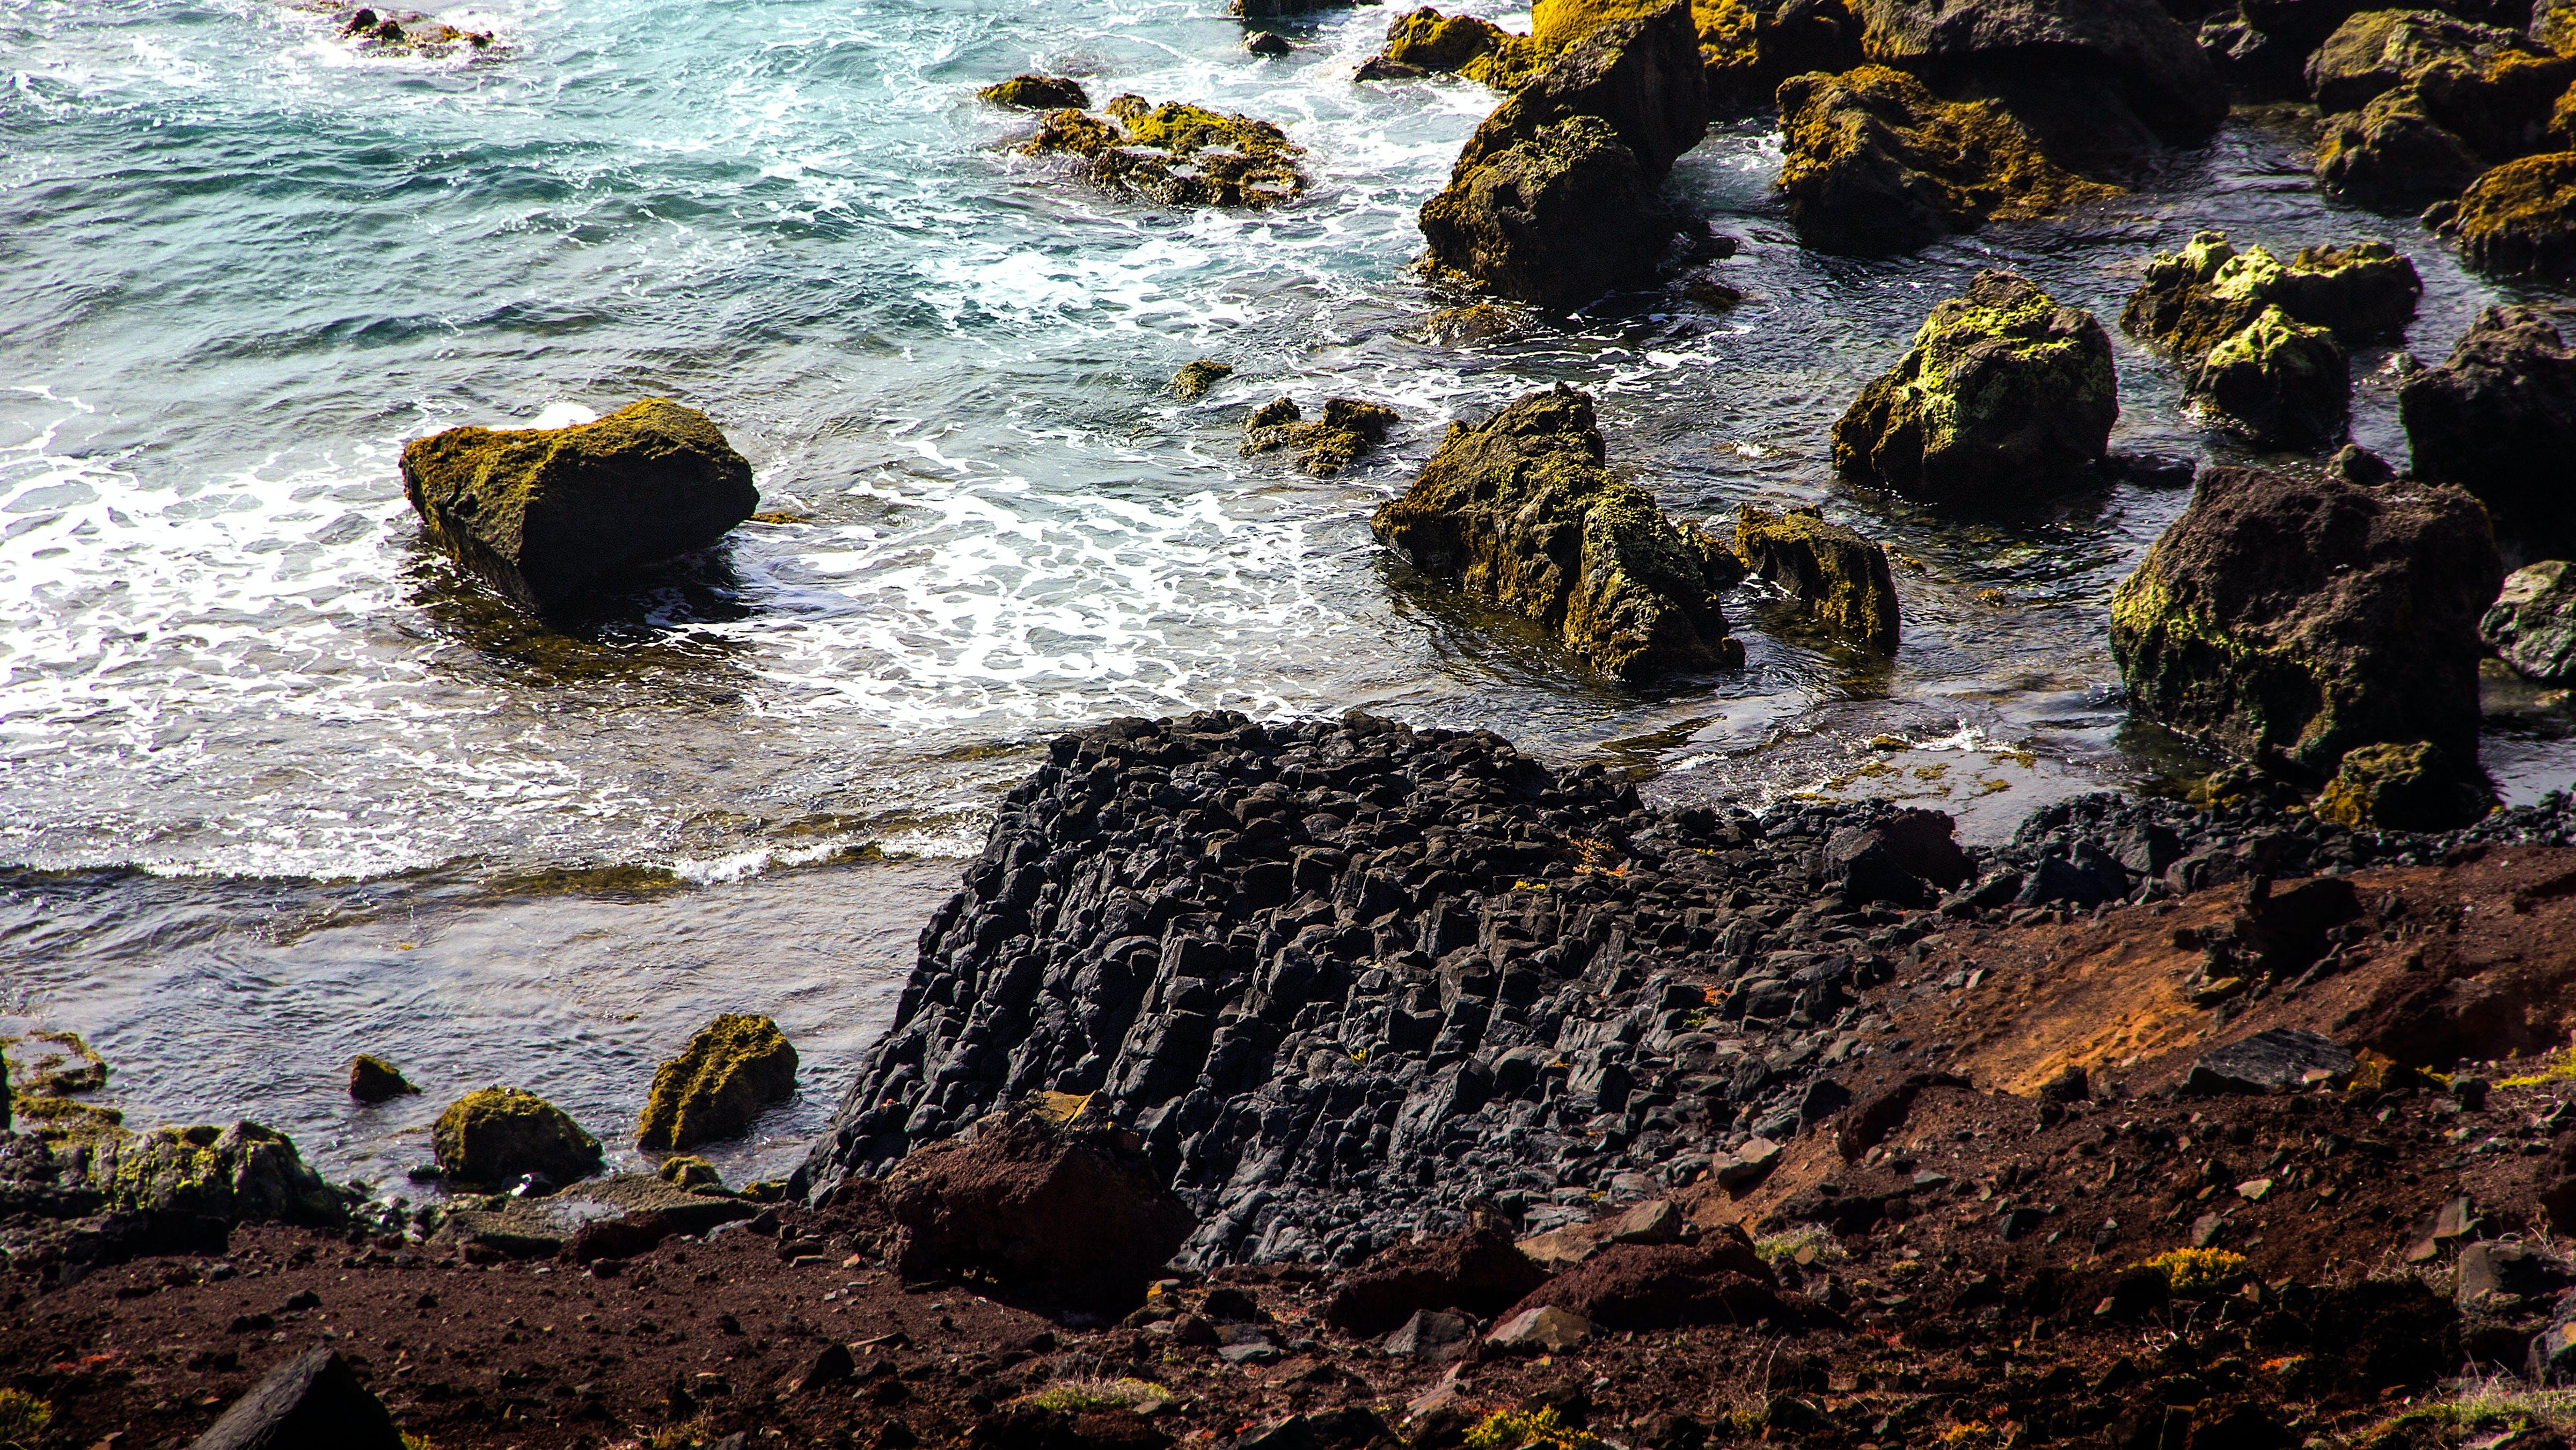 Free stock photo of Sad Sea